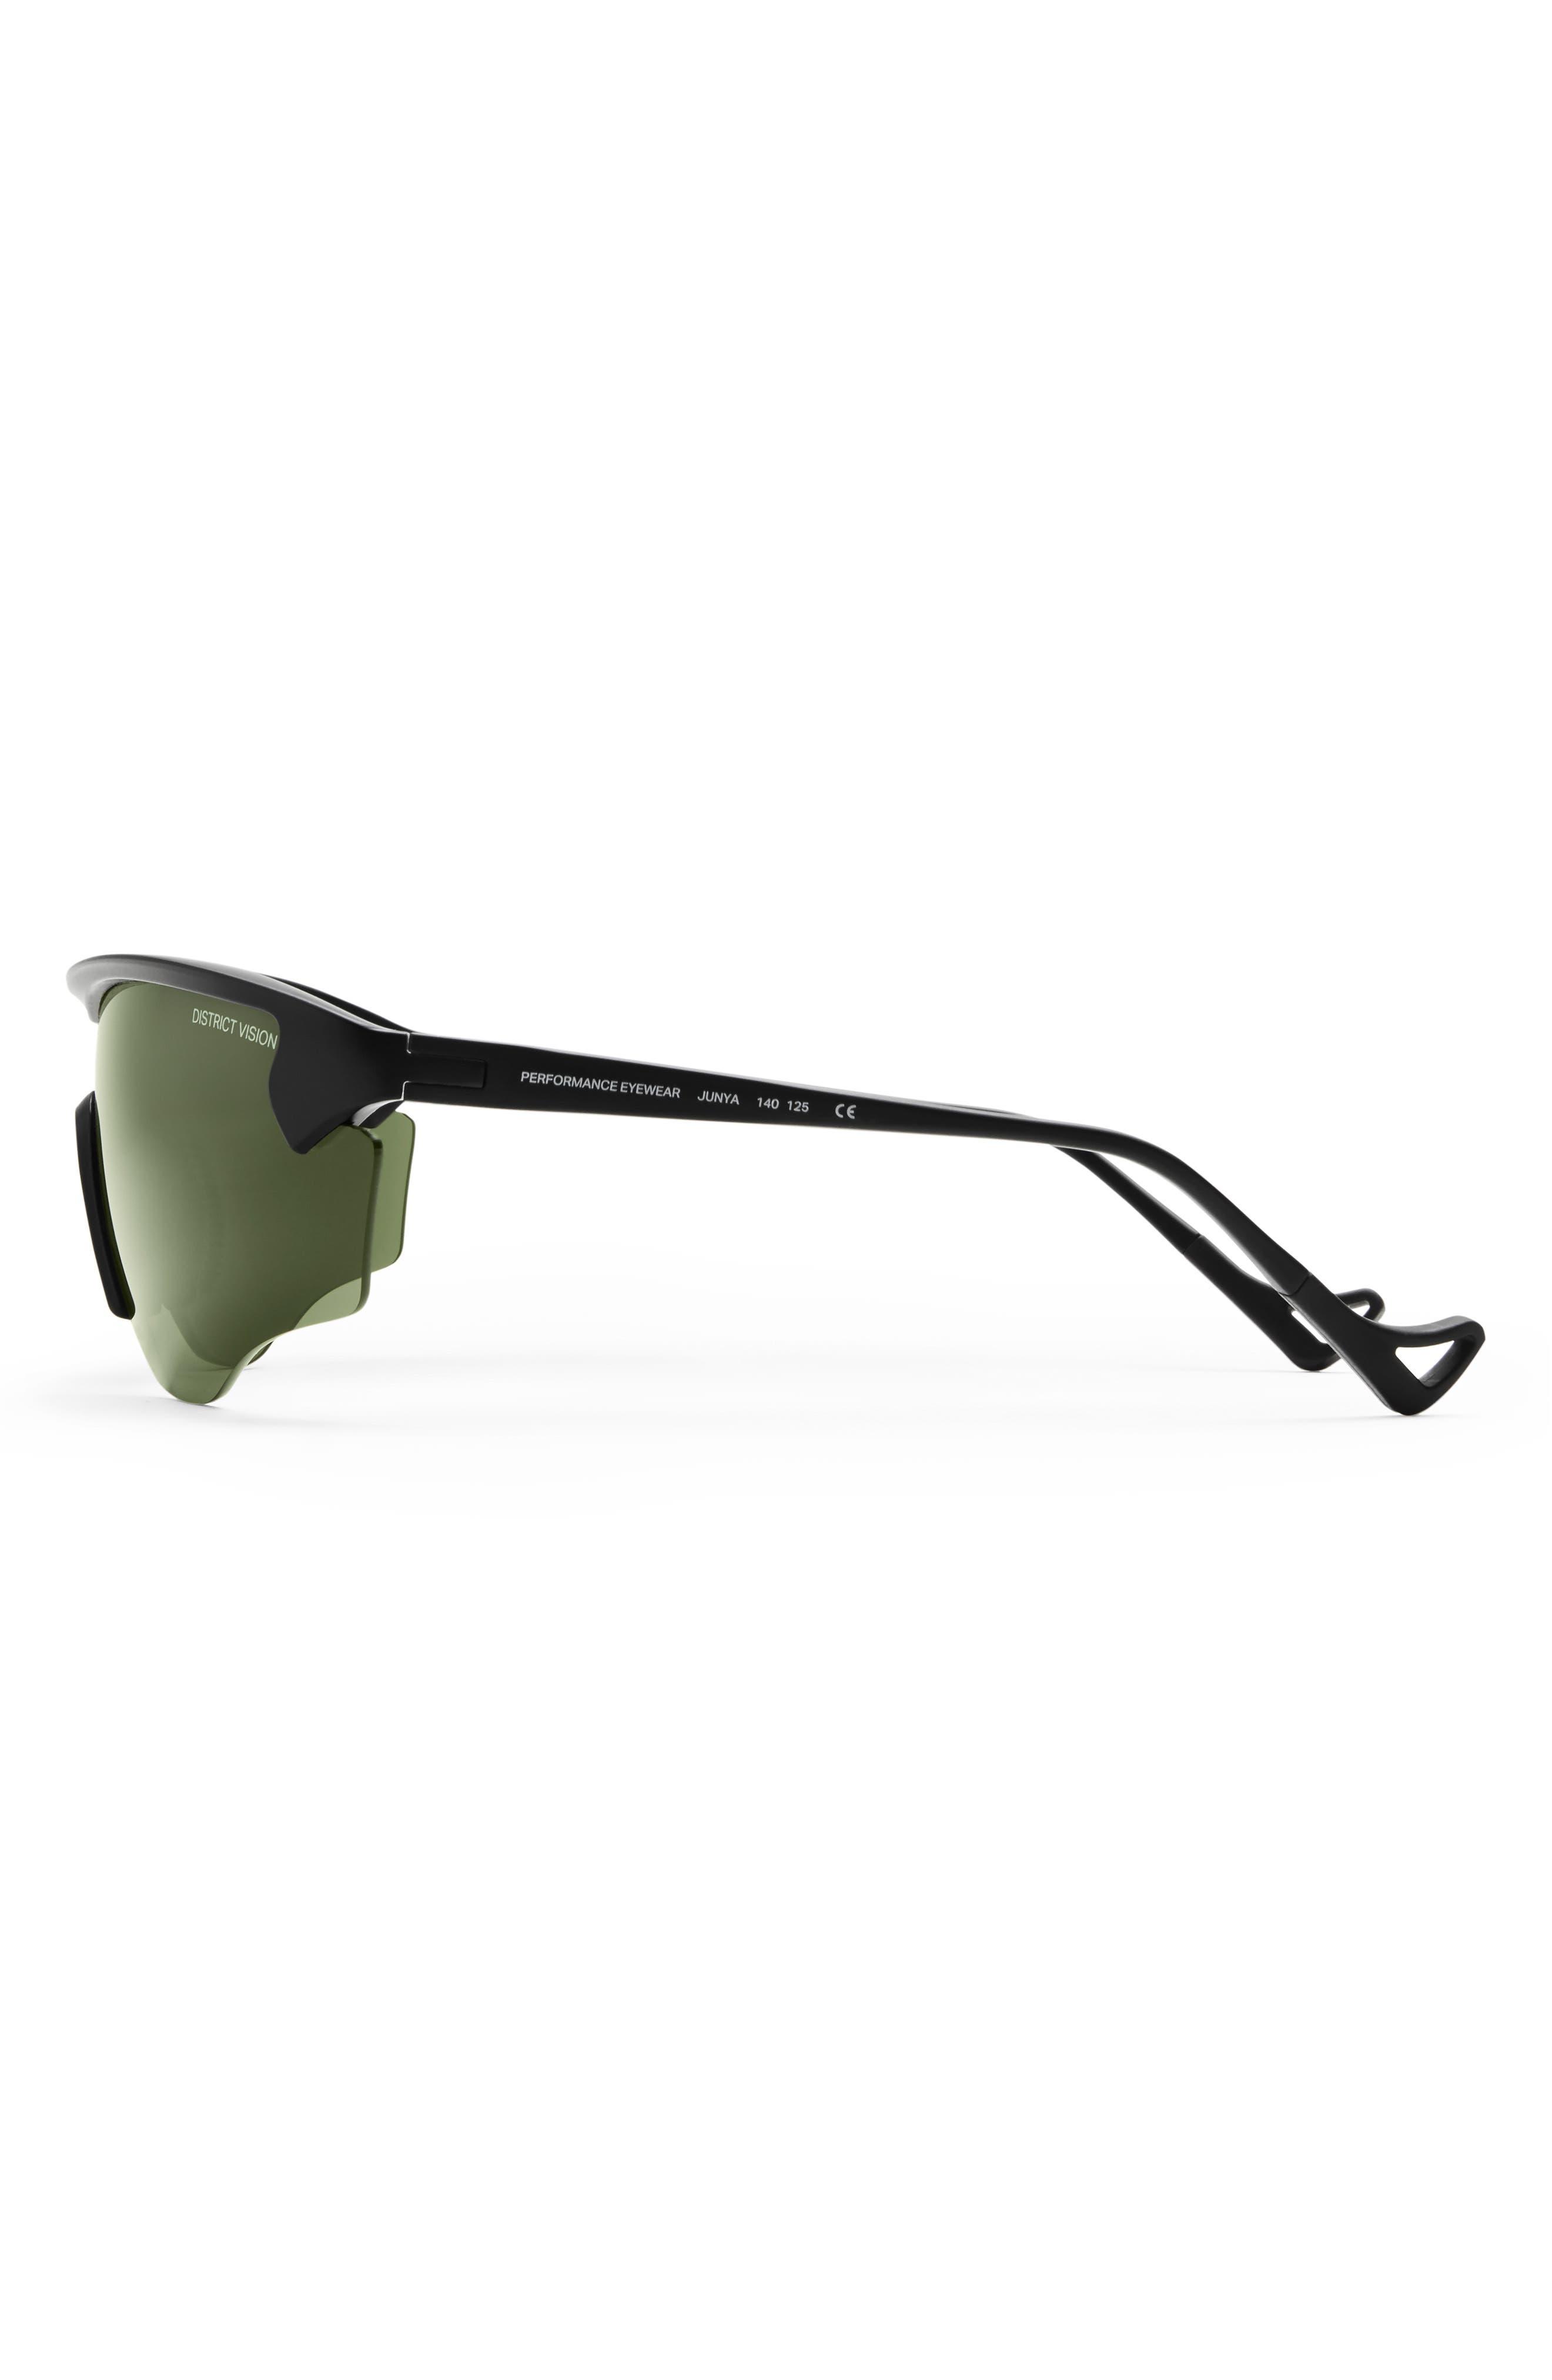 Junya 70mm Racing Sunglasses,                             Main thumbnail 1, color,                             BLACK/ SKY